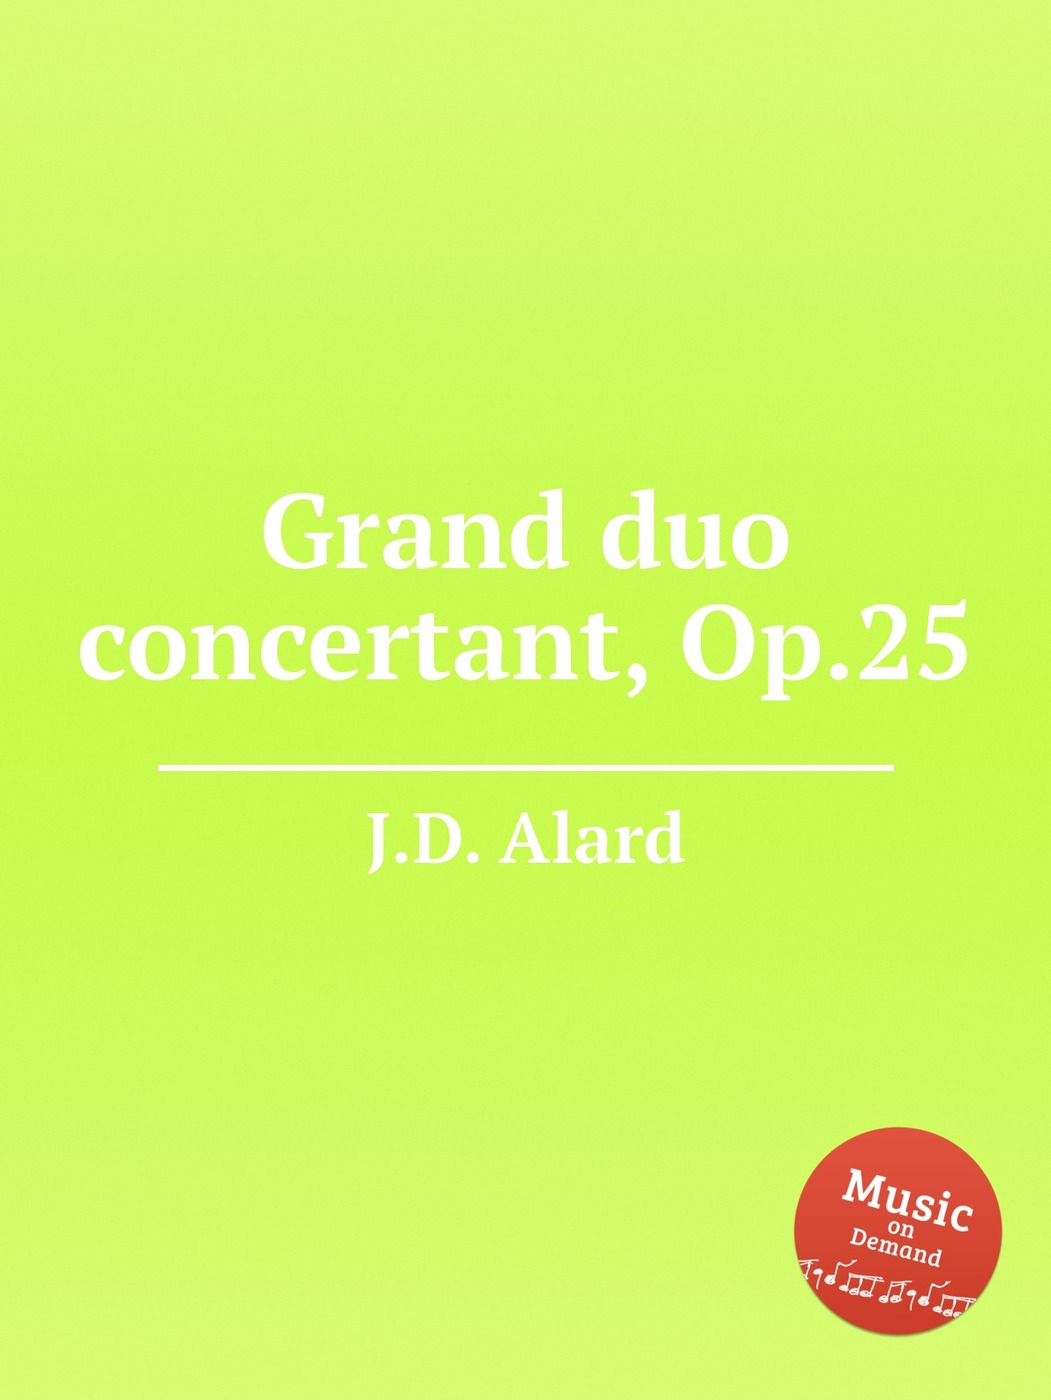 Grand duo concertant, Op.25